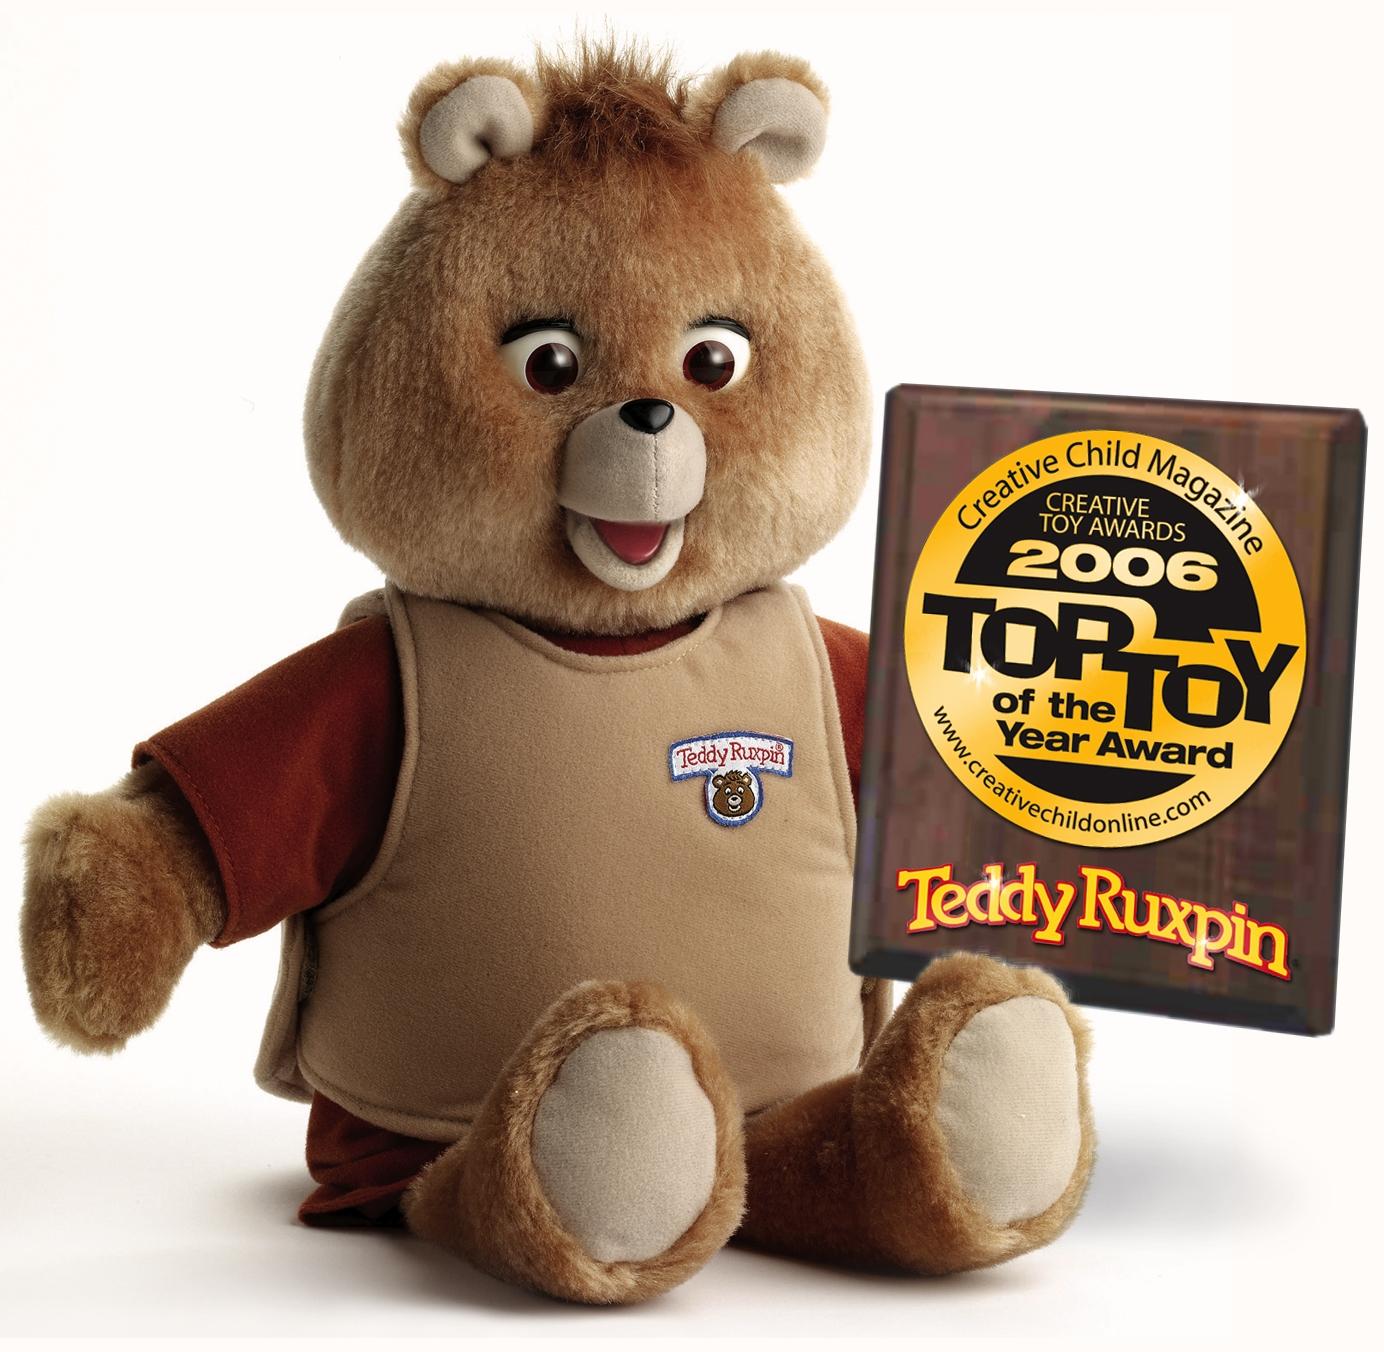 fresh from an extended hibernation  teddy ruxpin earns top